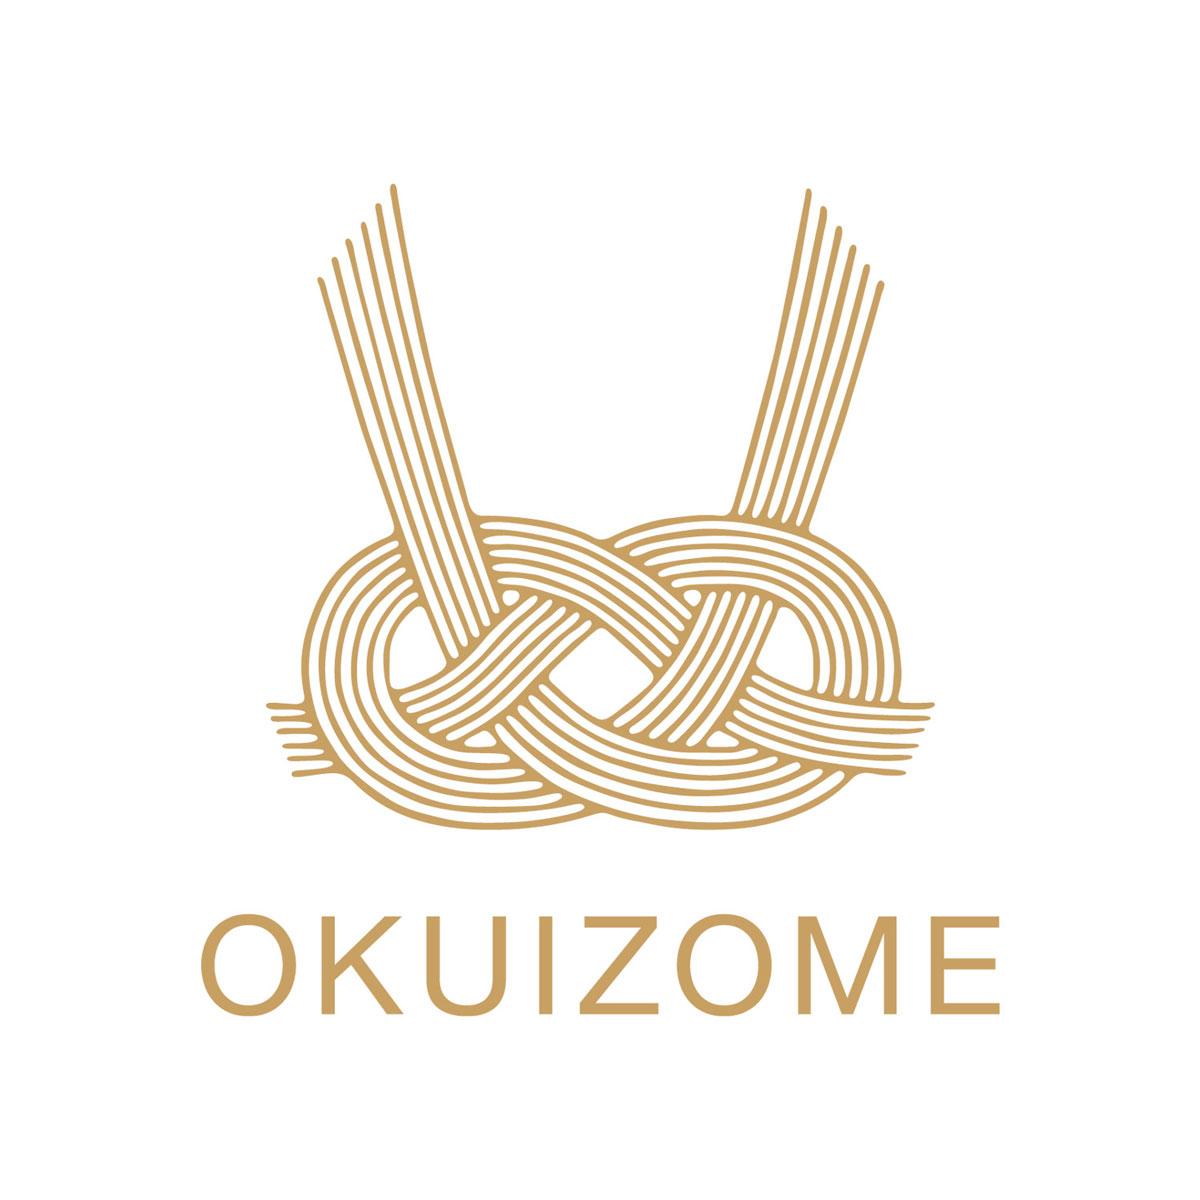 OKUIZOME / GOLD RIM